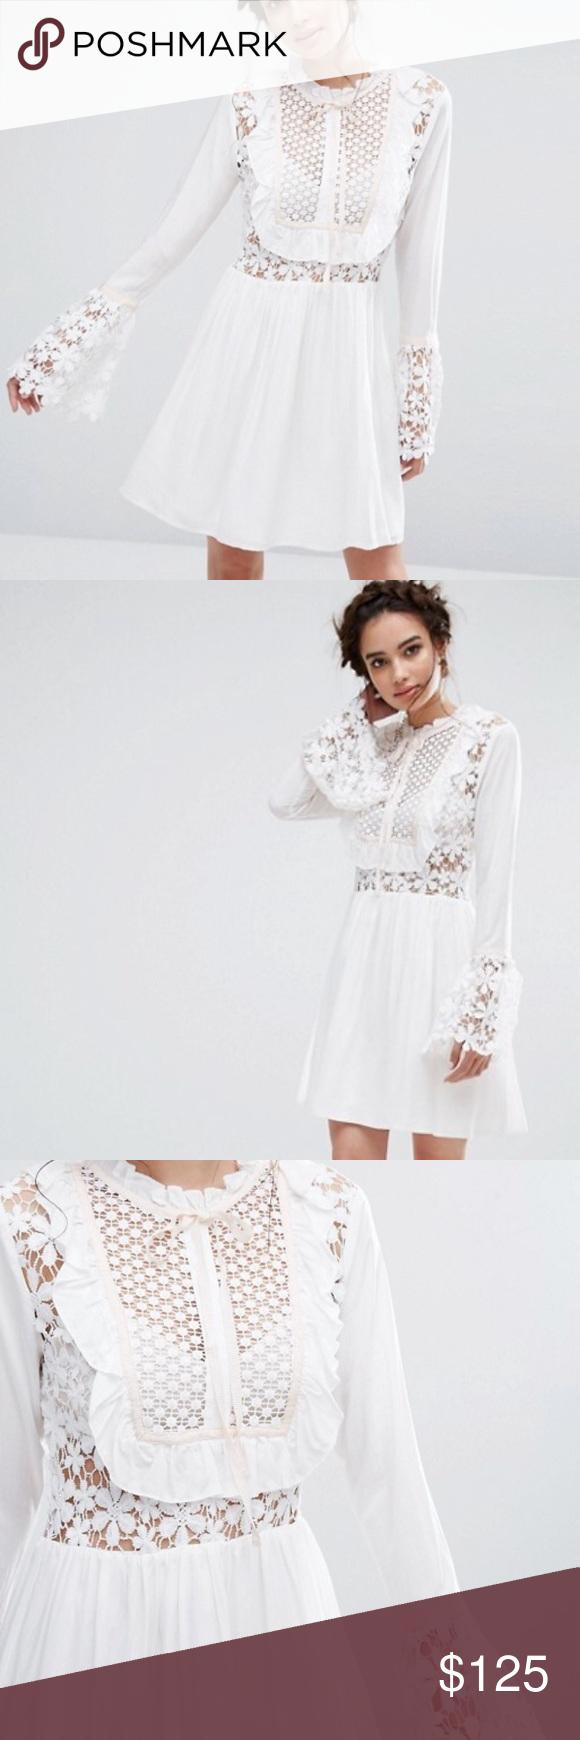 Gorgeous White Lace Dress Spring Dress